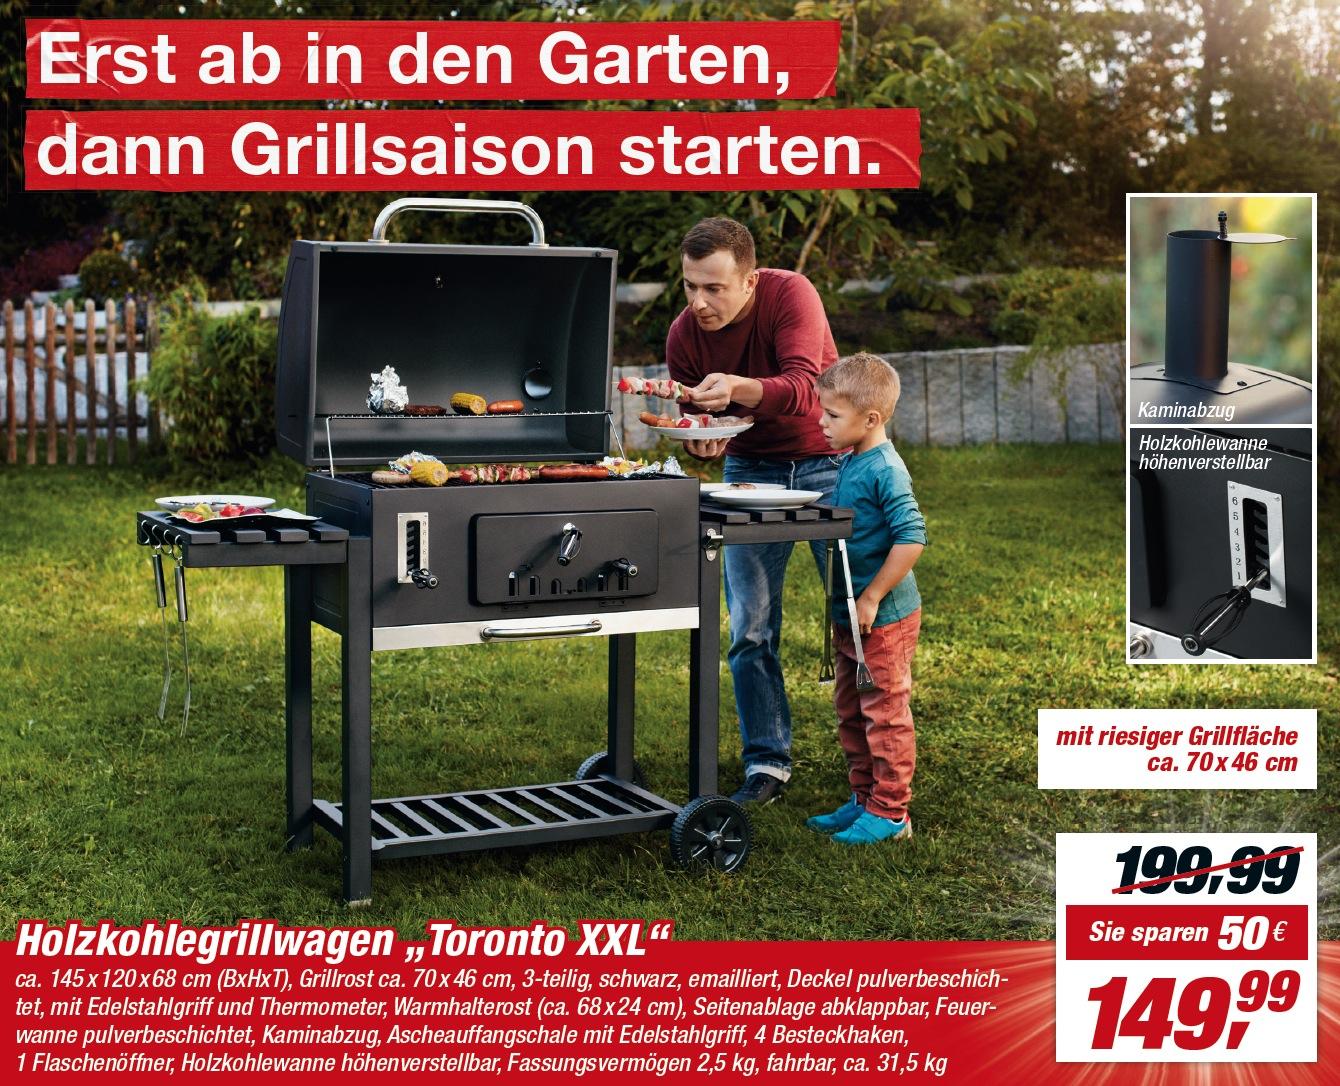 Tepro Toronto Holzkohlegrill Preis : Unboxing grill toronto xxl aufbau und vergleich vs toronto